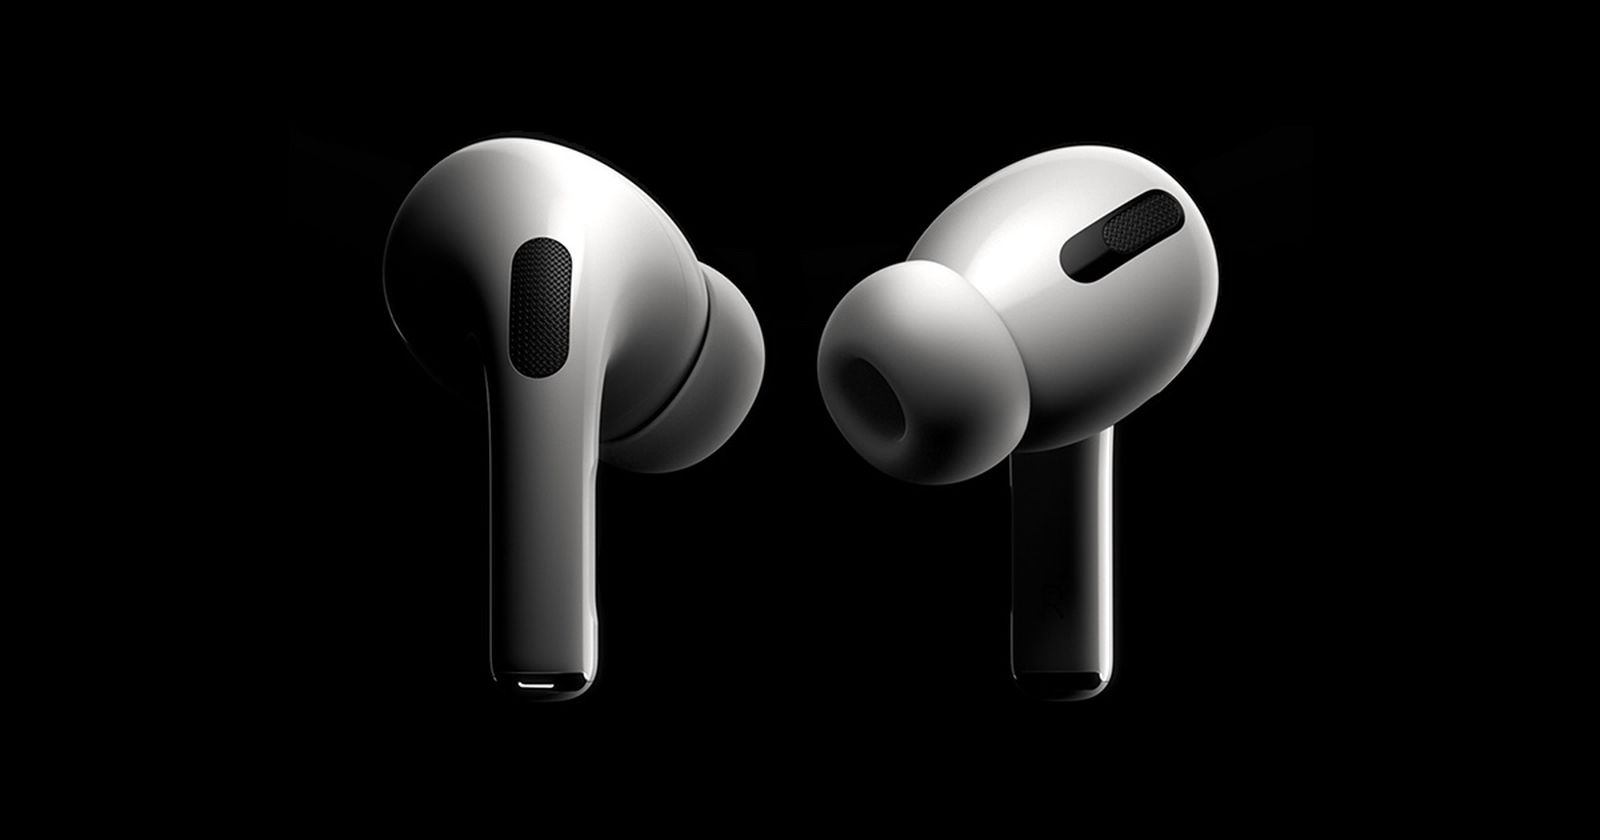 iOS 15 Breaks Siri AirPods Pro Controls, Fix Coming in iOS 15.1